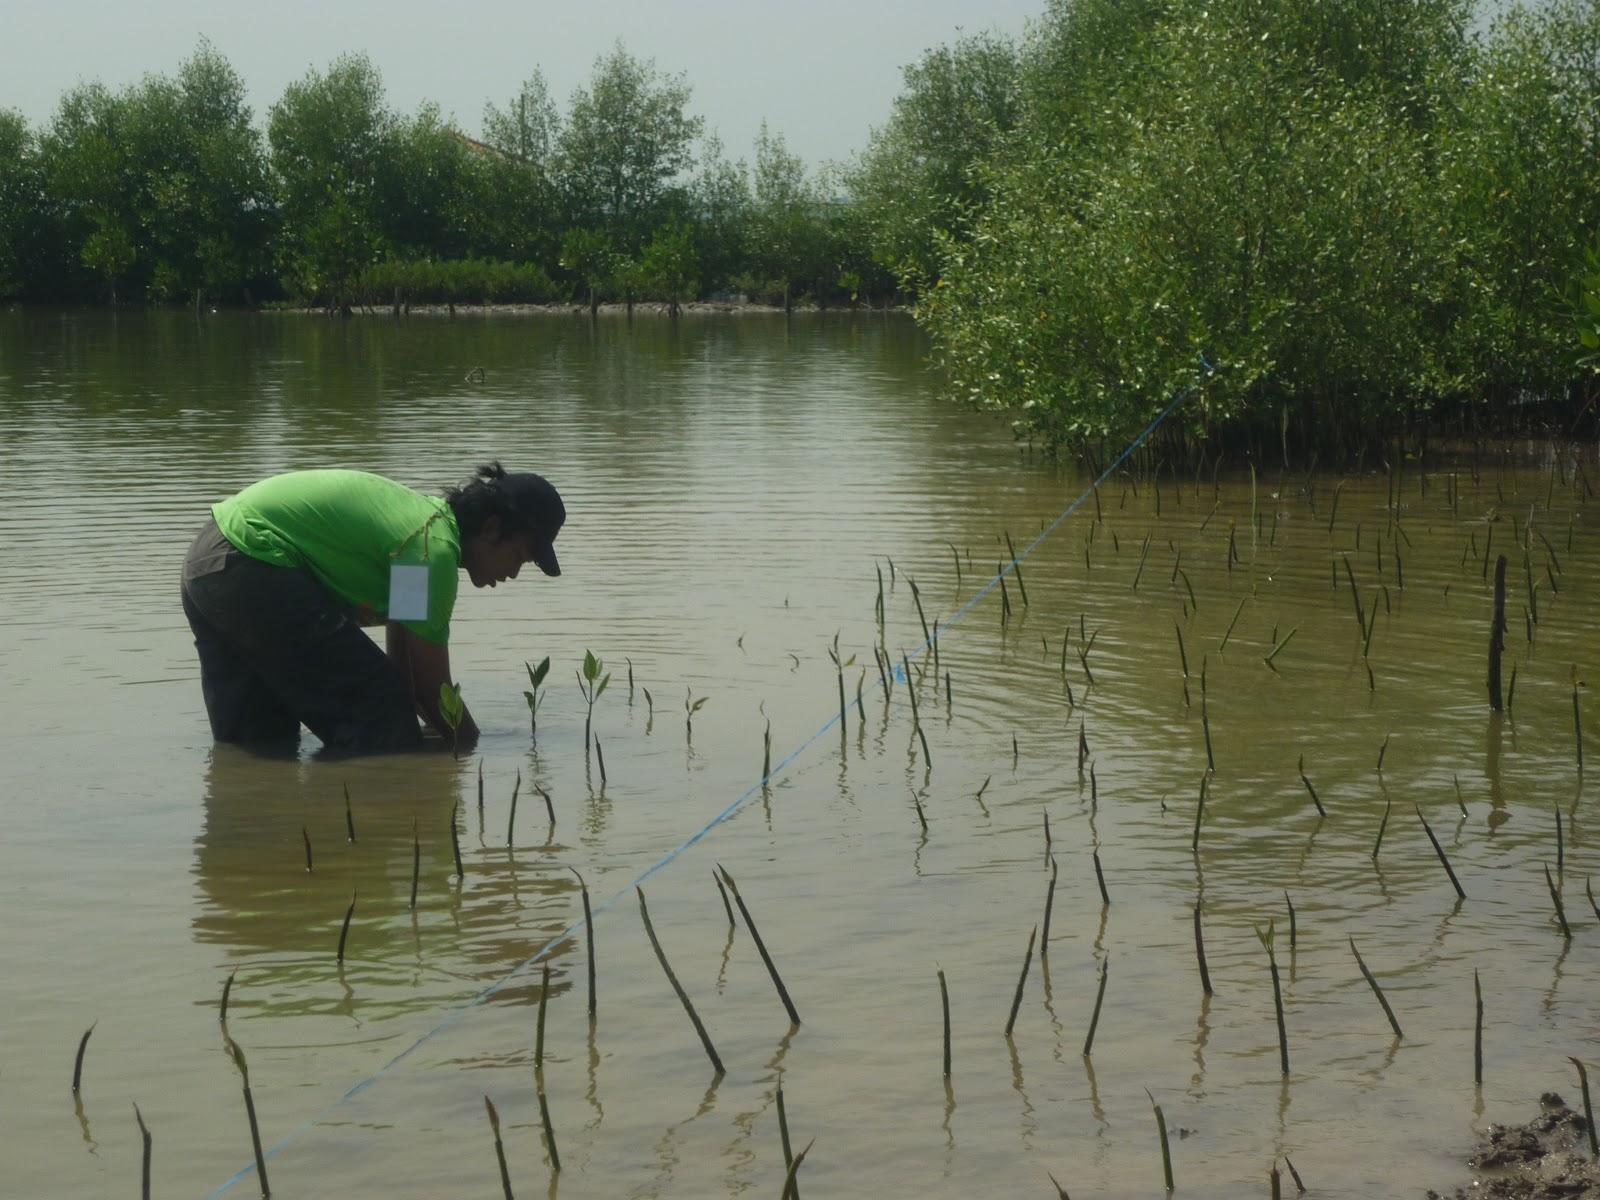 Peserta GBC Mangrove nampak menanam bibit mangrove jenis Rhizophora. (Foto: Dokumentasi pribadi).